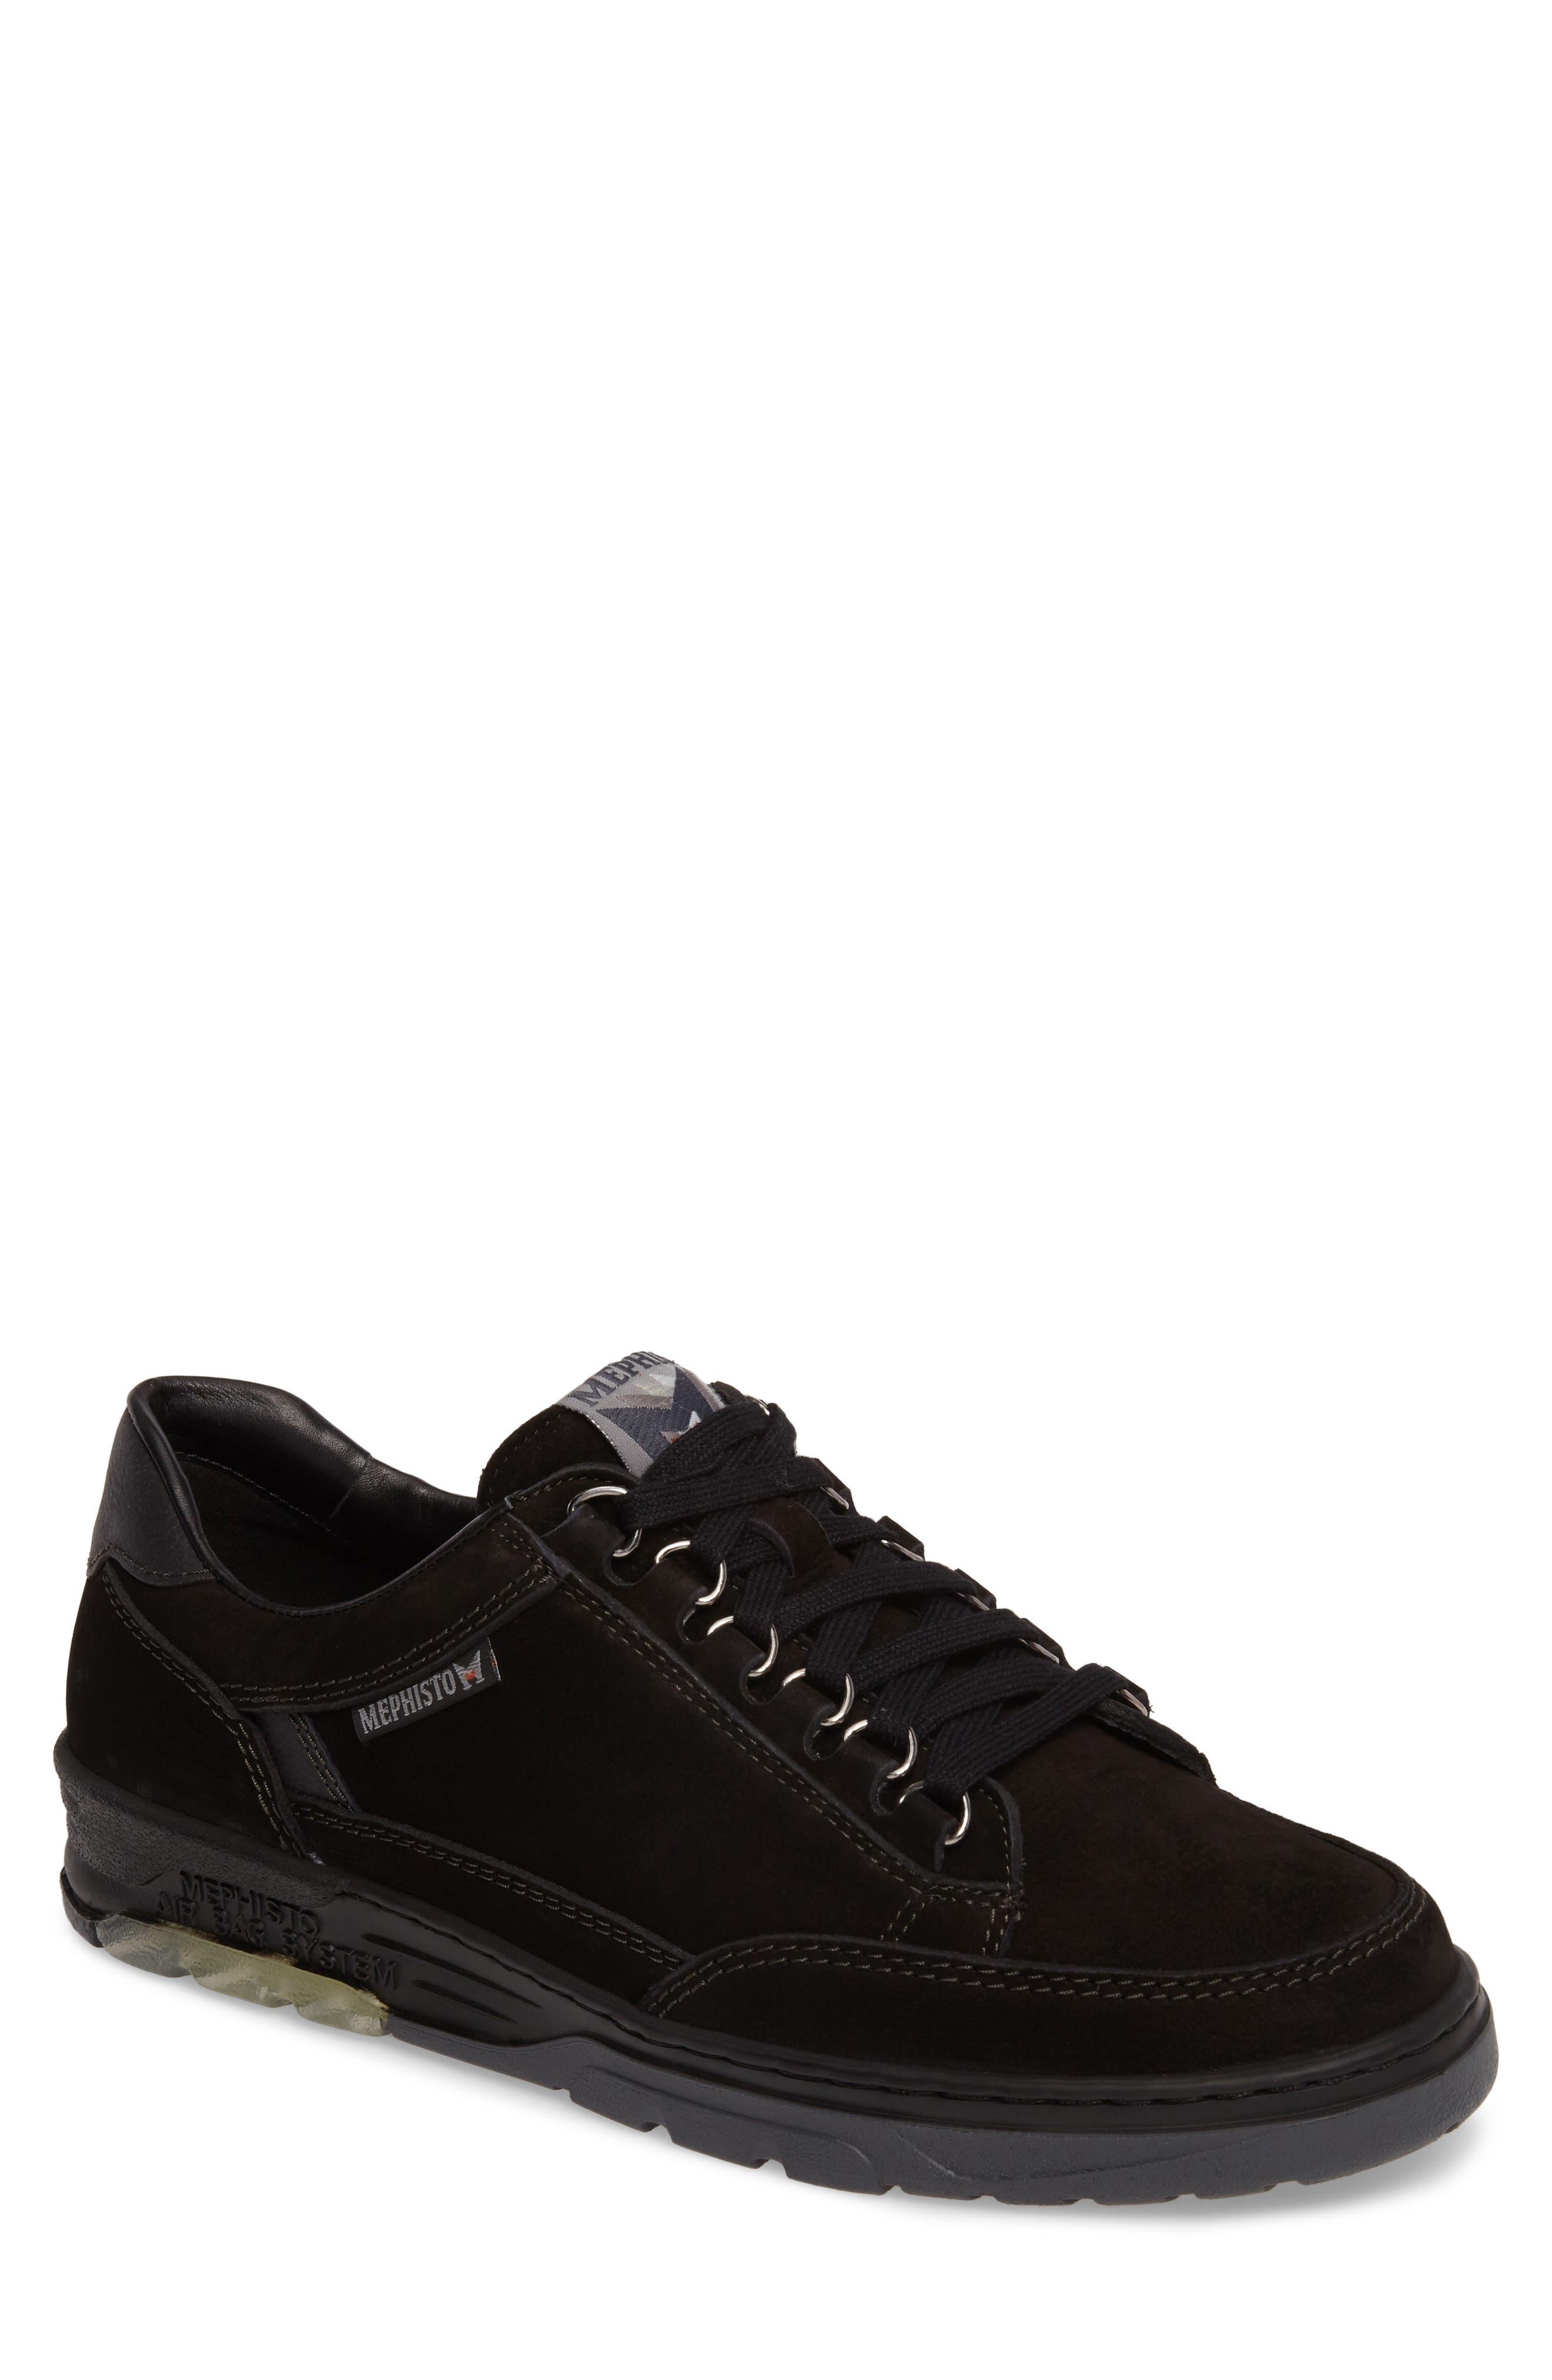 Mick Sneaker,                         Main,                         color, BLACK SPORTBUCK